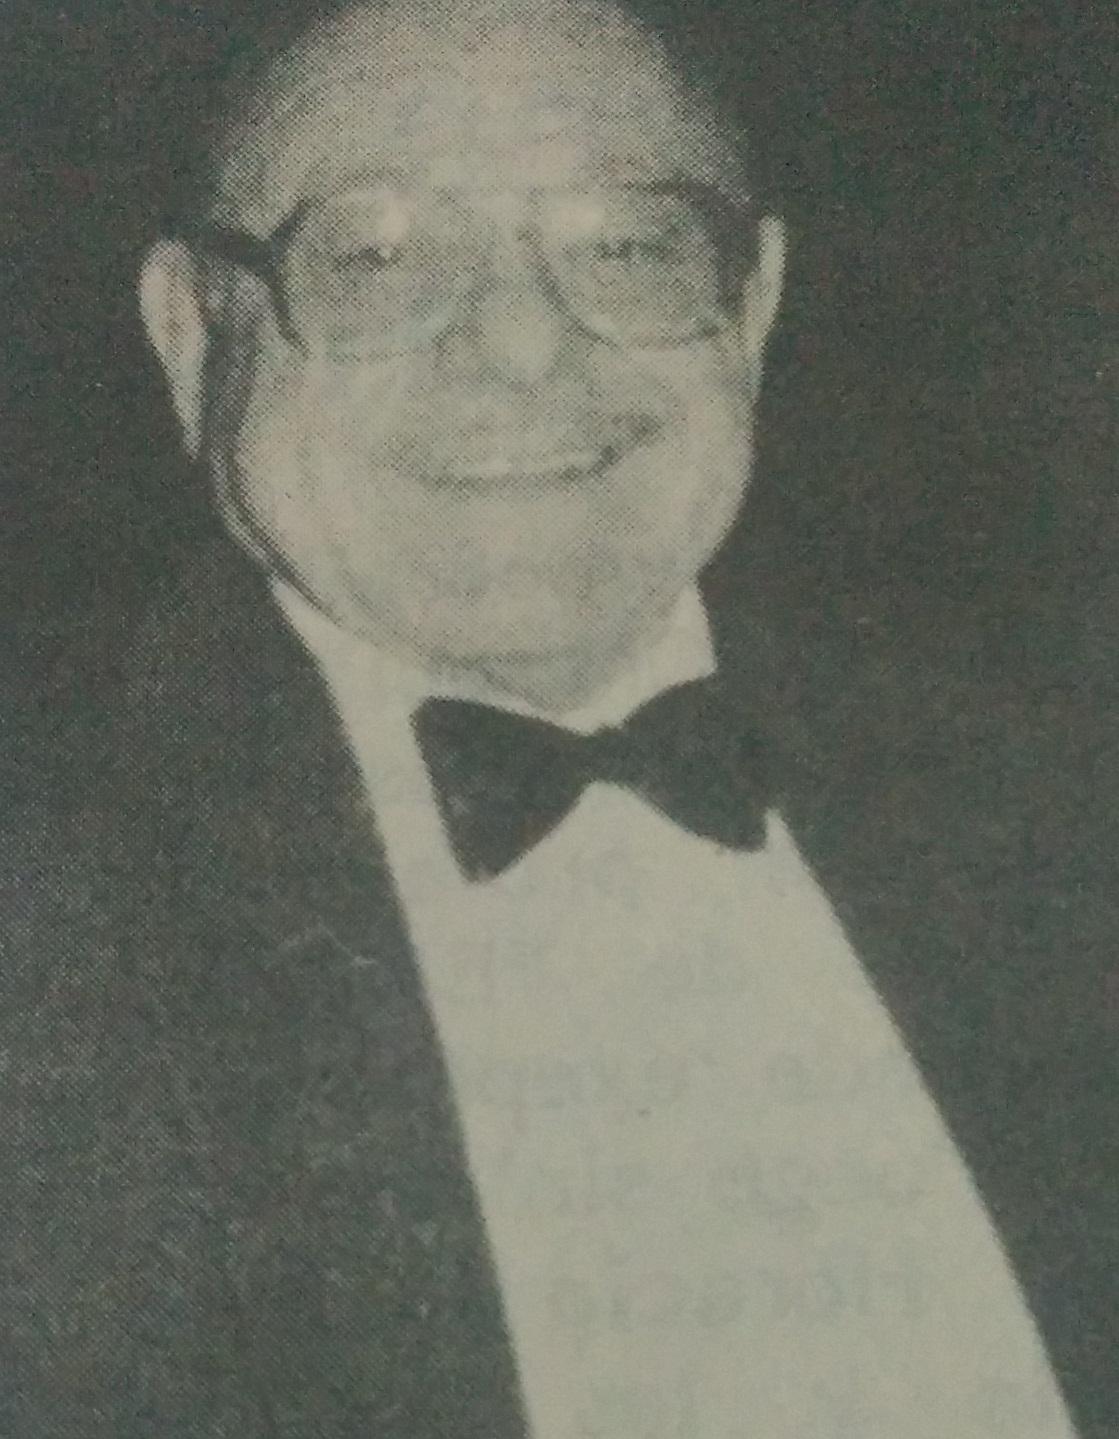 Profesor, Dr. Alfredo Ángel Roggiano (1919-1991).